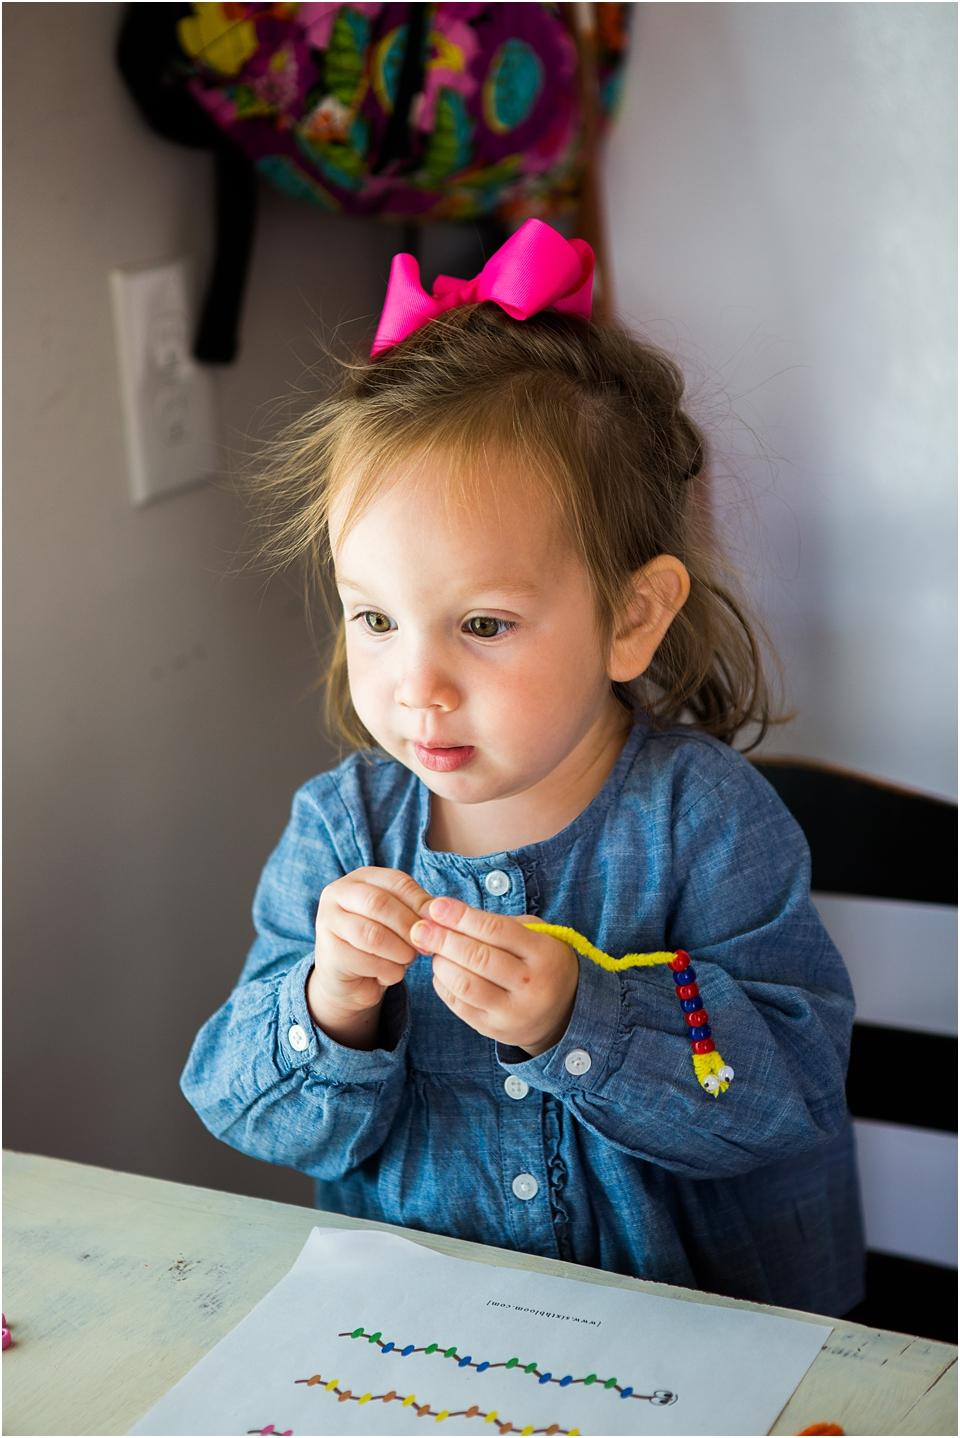 free coding worksheets #STEAM #Preschool #preschooler #freeprintable #printable #earthwormactivity #screenfree #preschool #stemkids #stem